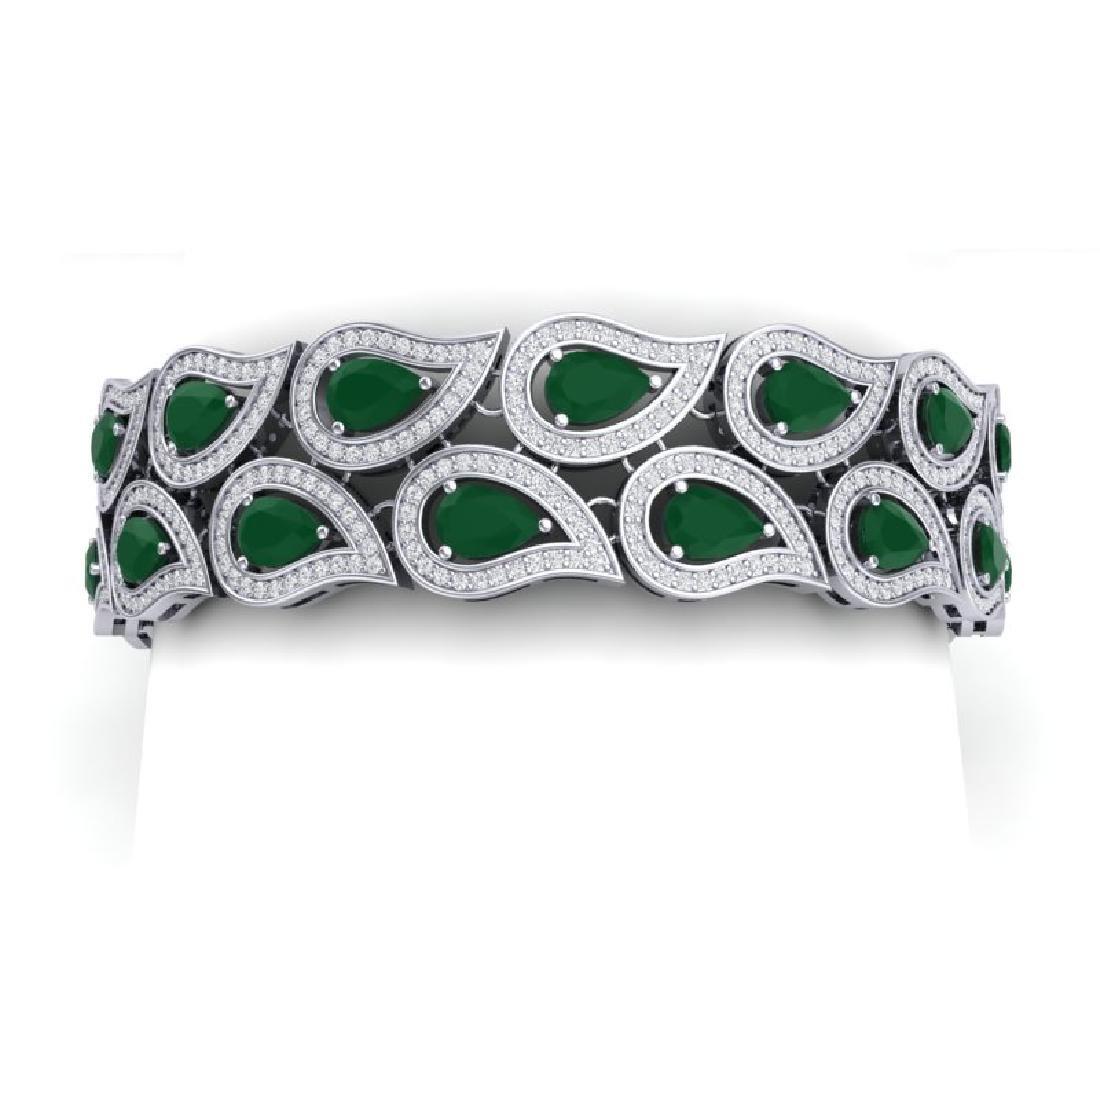 20.1 CTW Royalty Emerald & VS Diamond Bracelet 18K